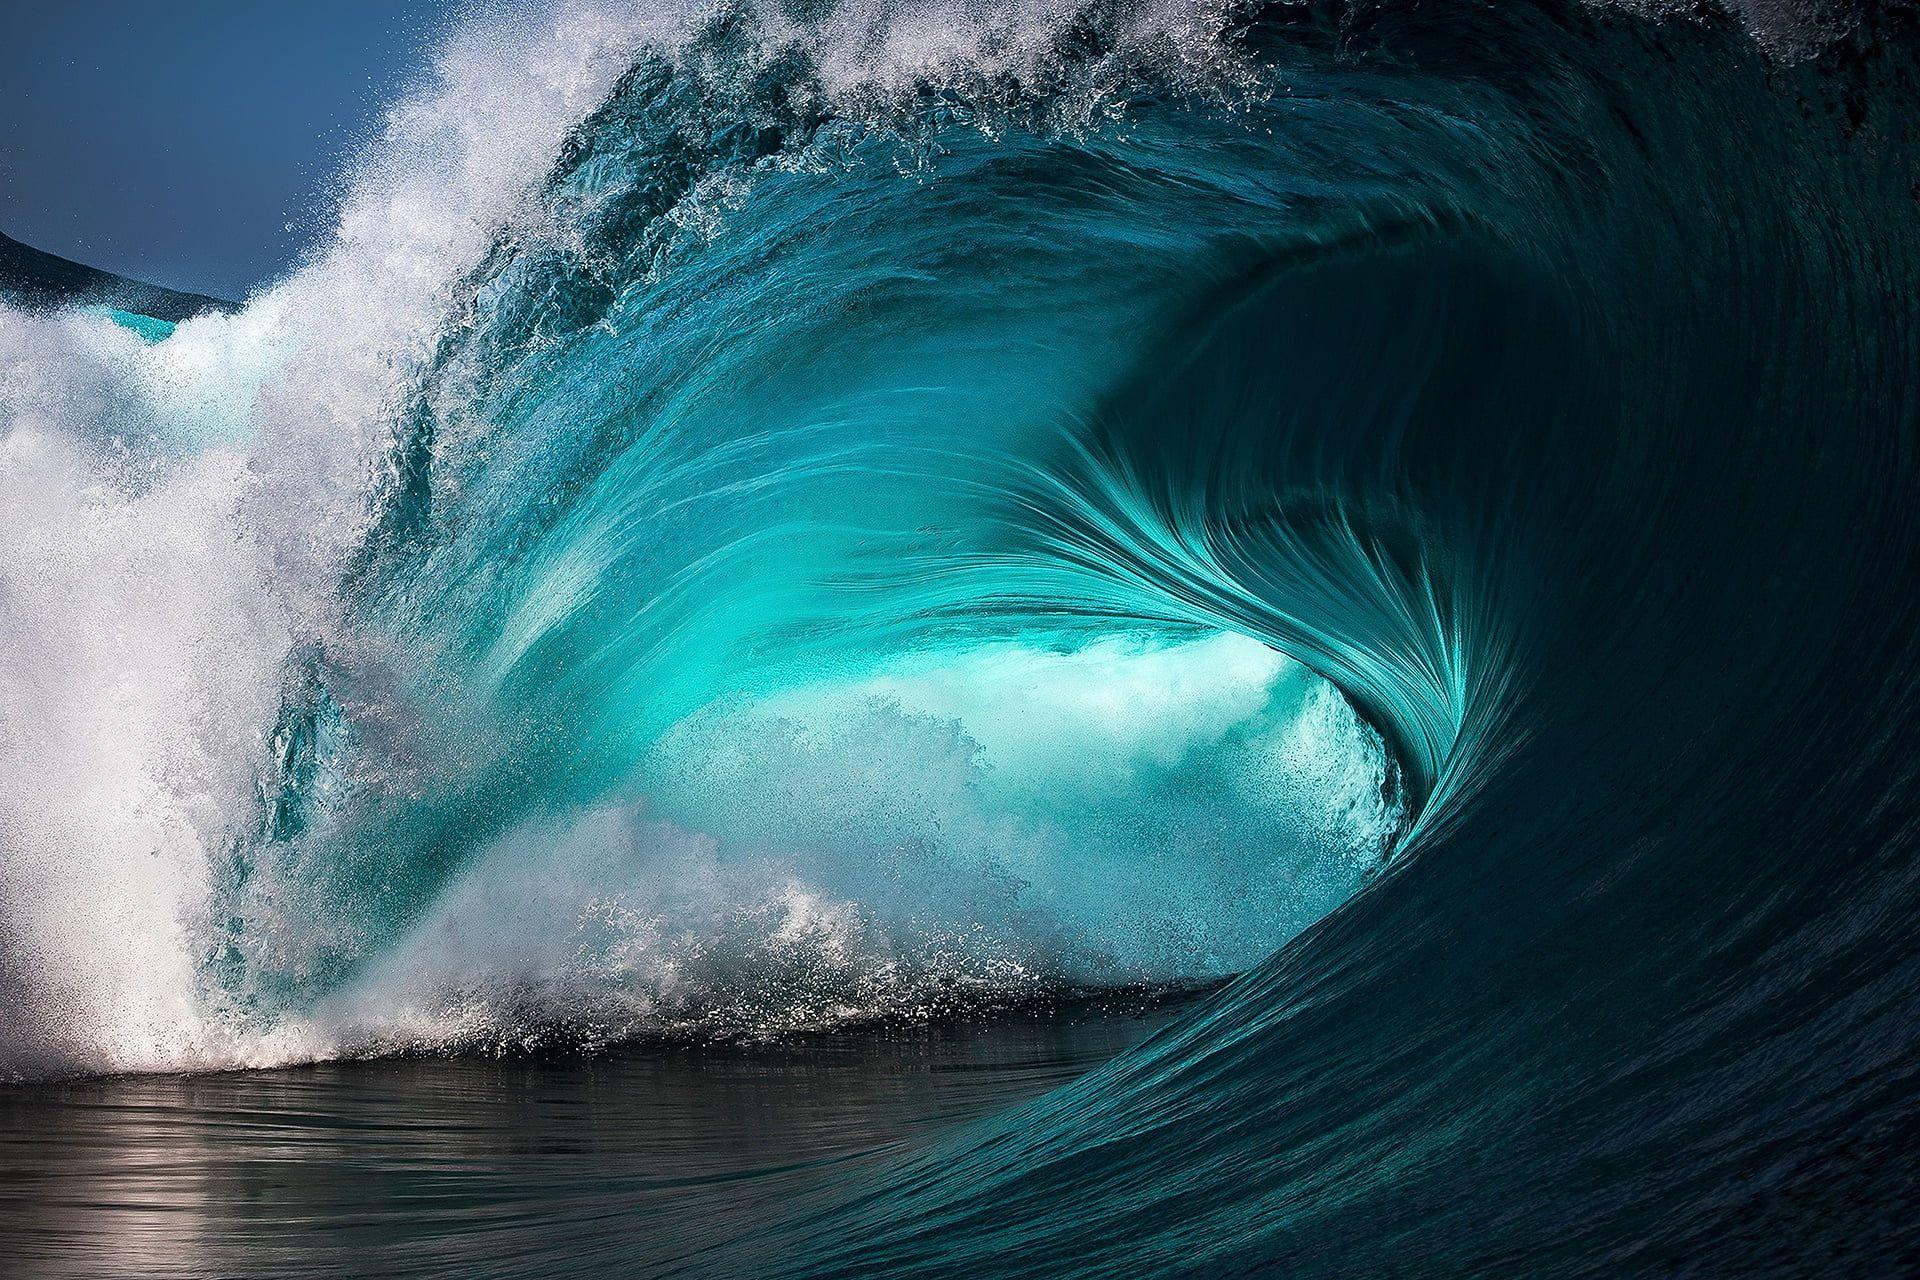 Ocean Wave Sea Waves Blue Water Turquoise Splashes Cyan 1080p Wallpaper Hdwallpaper Desktop Waves Ocean Waves Ocean Wallpaper